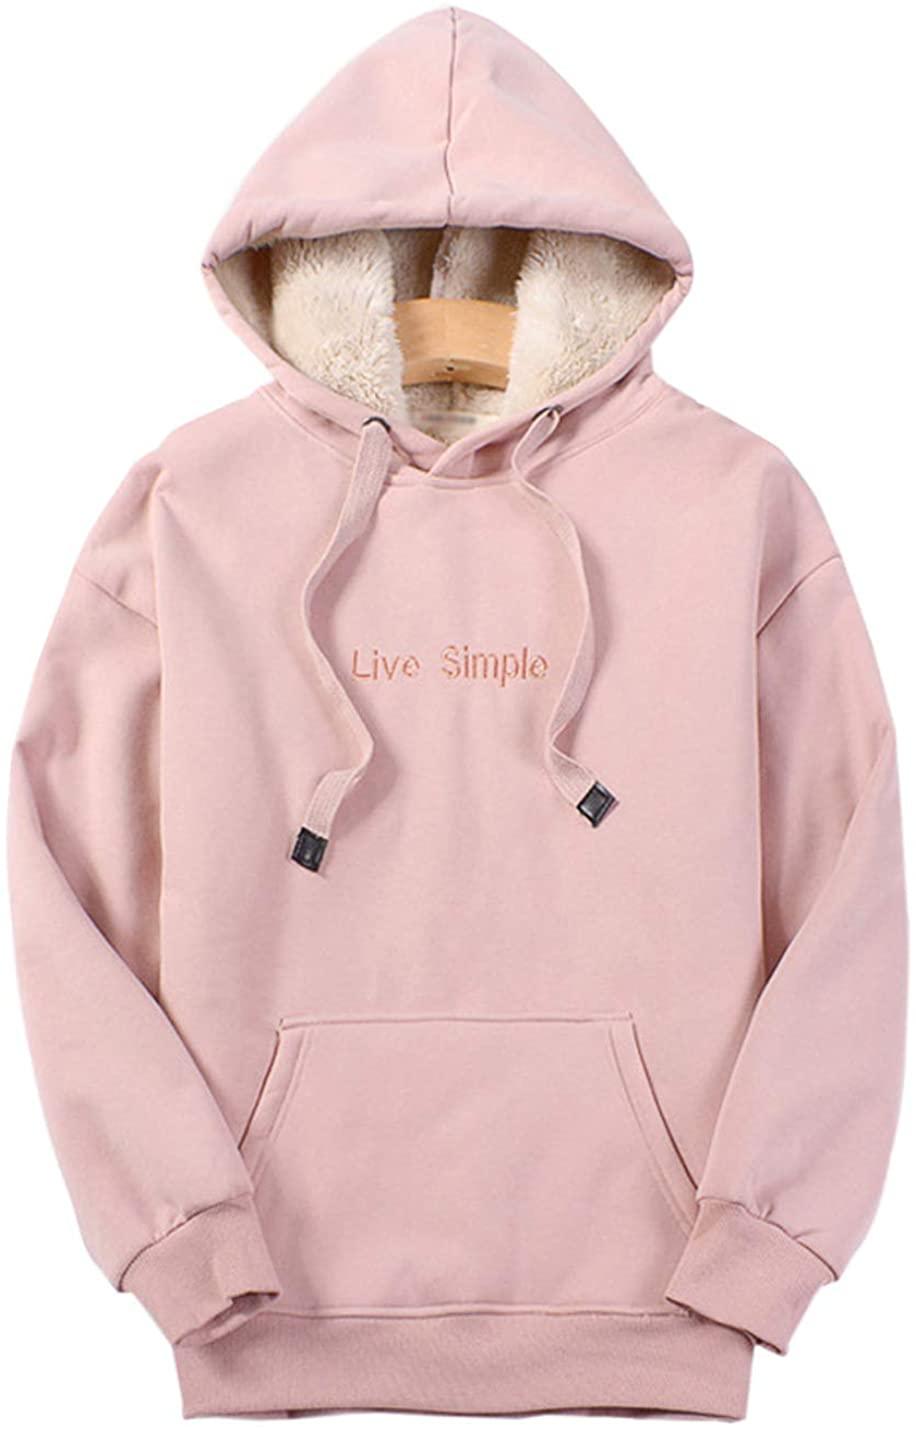 Gihuo Women's Winter Sherpa Lined Pullover Sweatshirt Hoodie